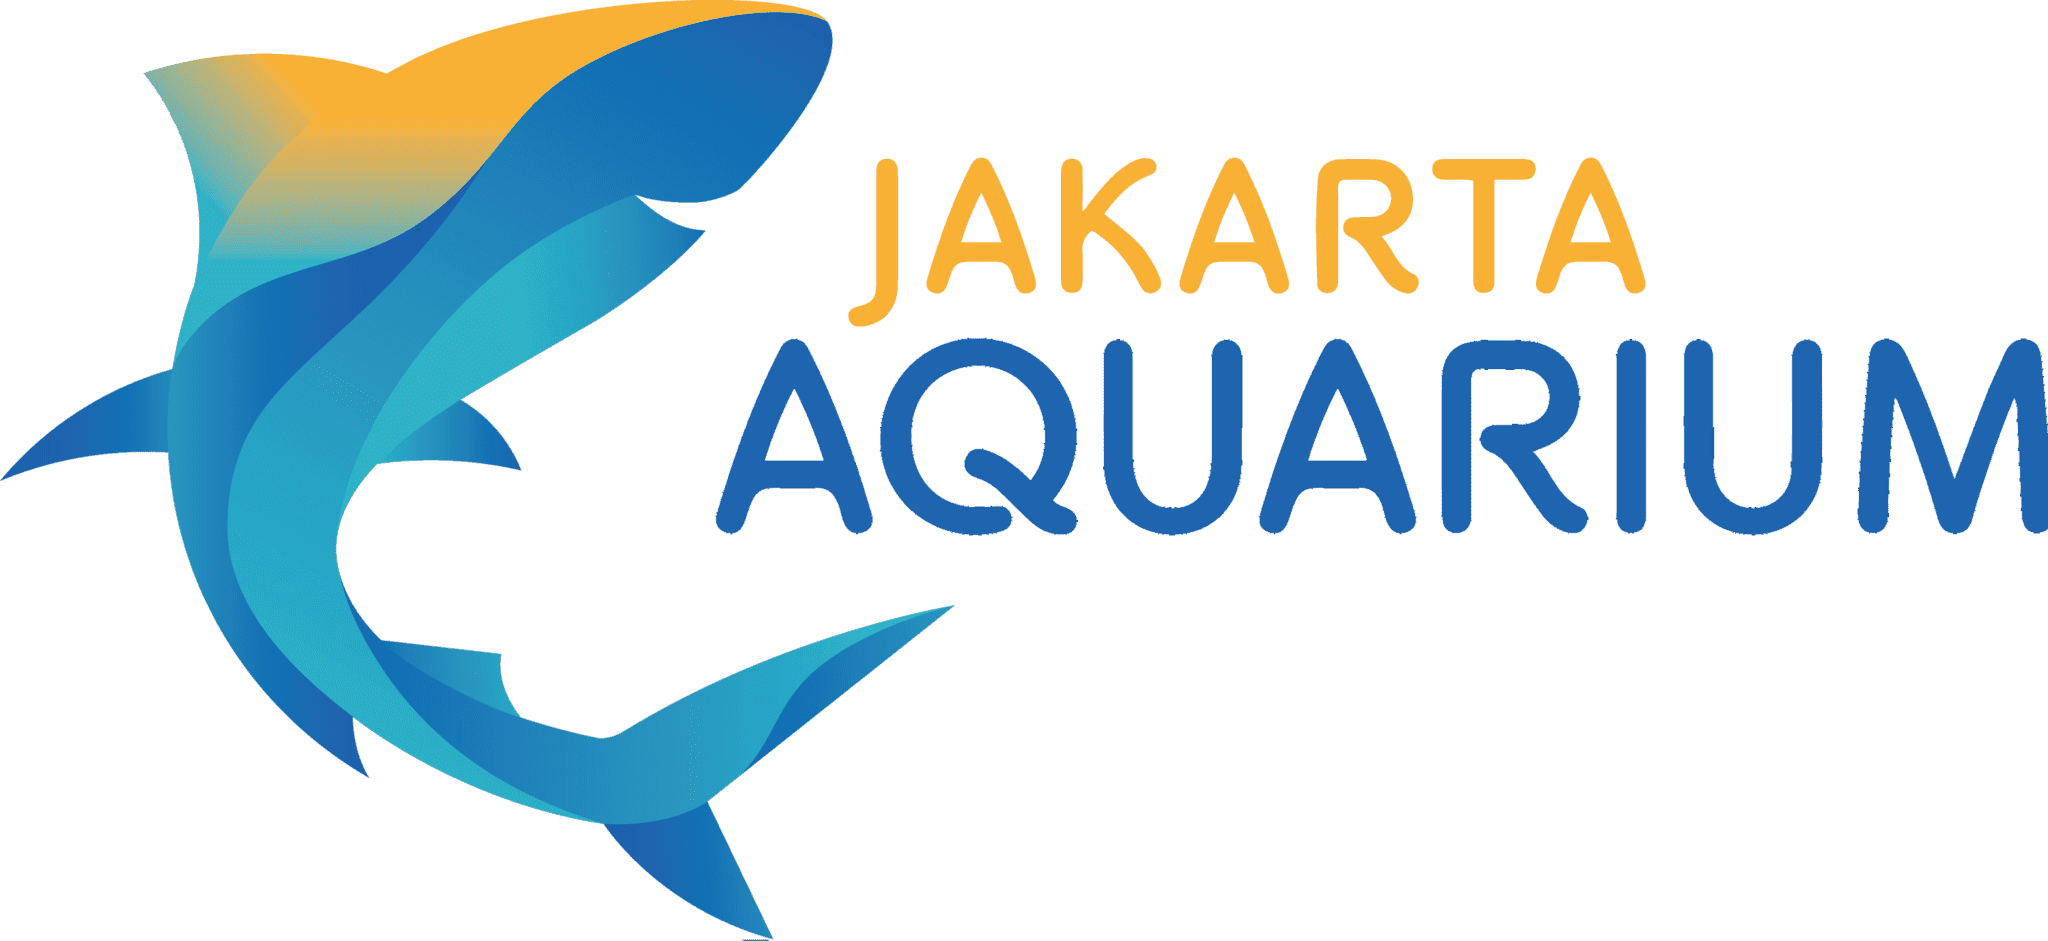 Jakarta Aquarium - Background